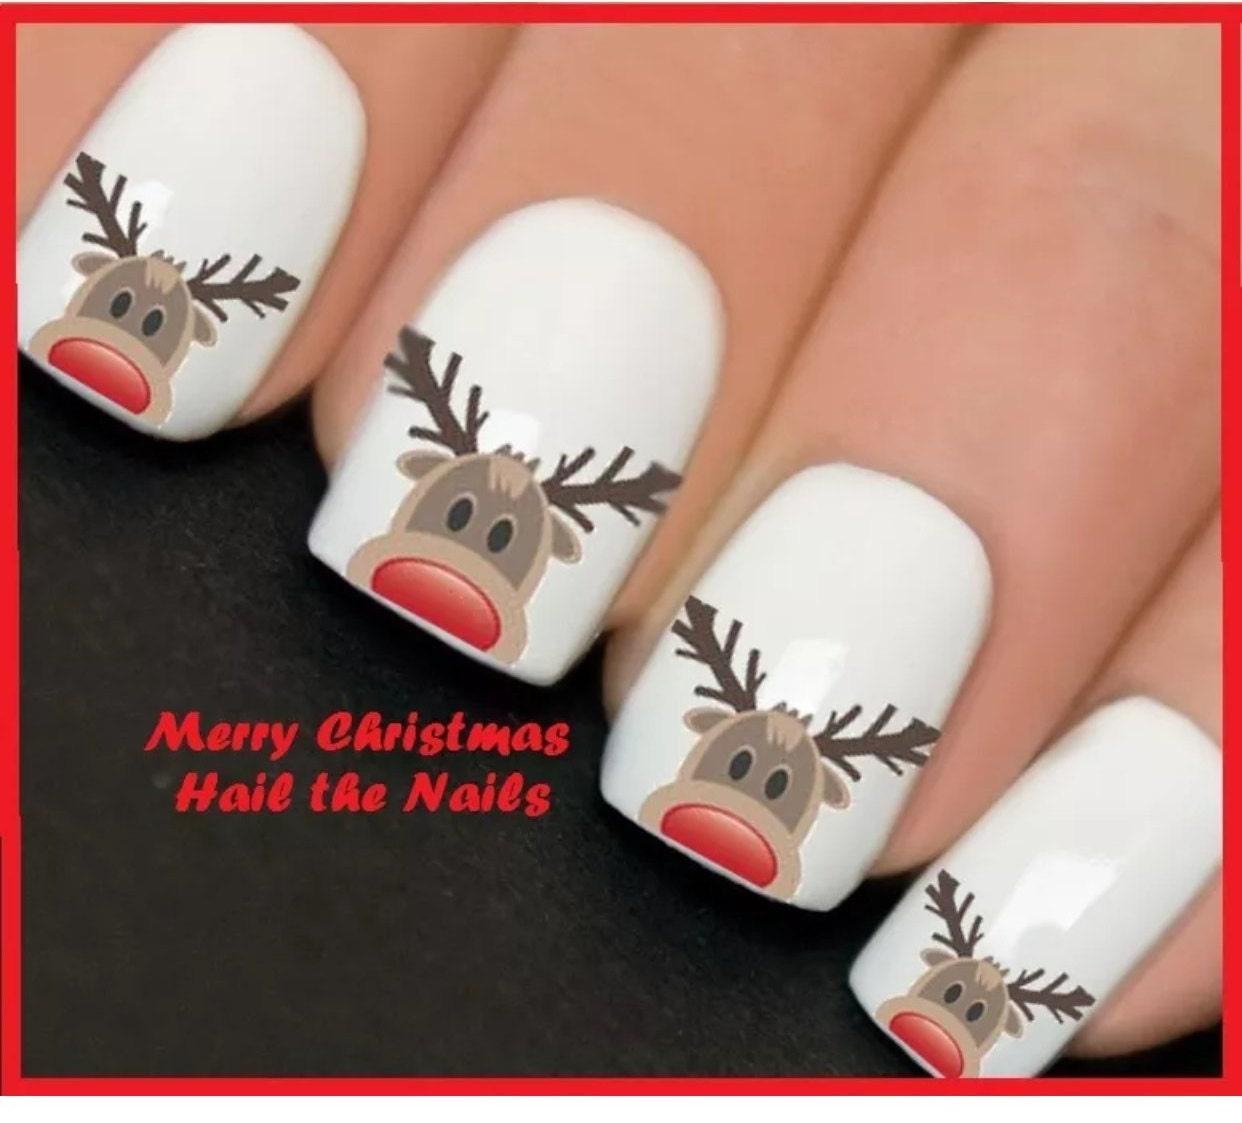 Reindeer Nail Art: Rudolf Reindeer Nails Nail Art Decals Wraps Stickers